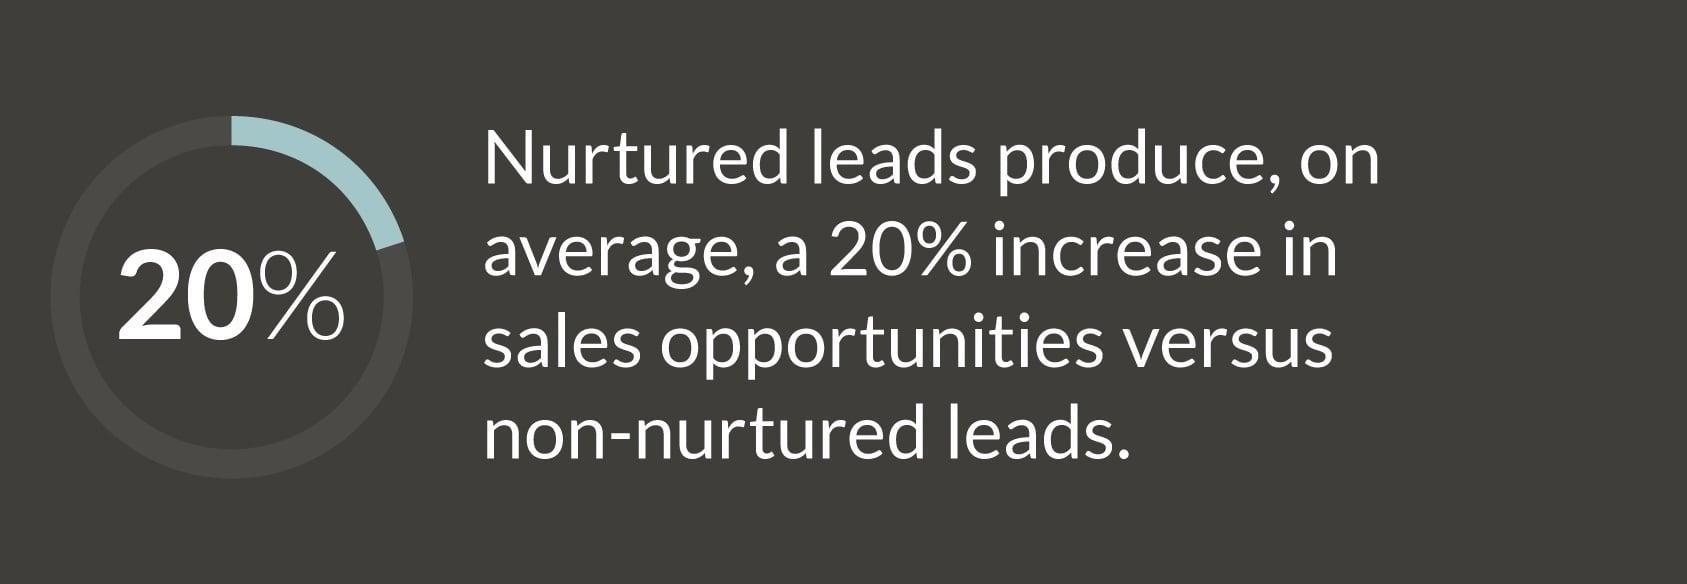 JONESBlog-april28-2020-lead-nurturing-stat3